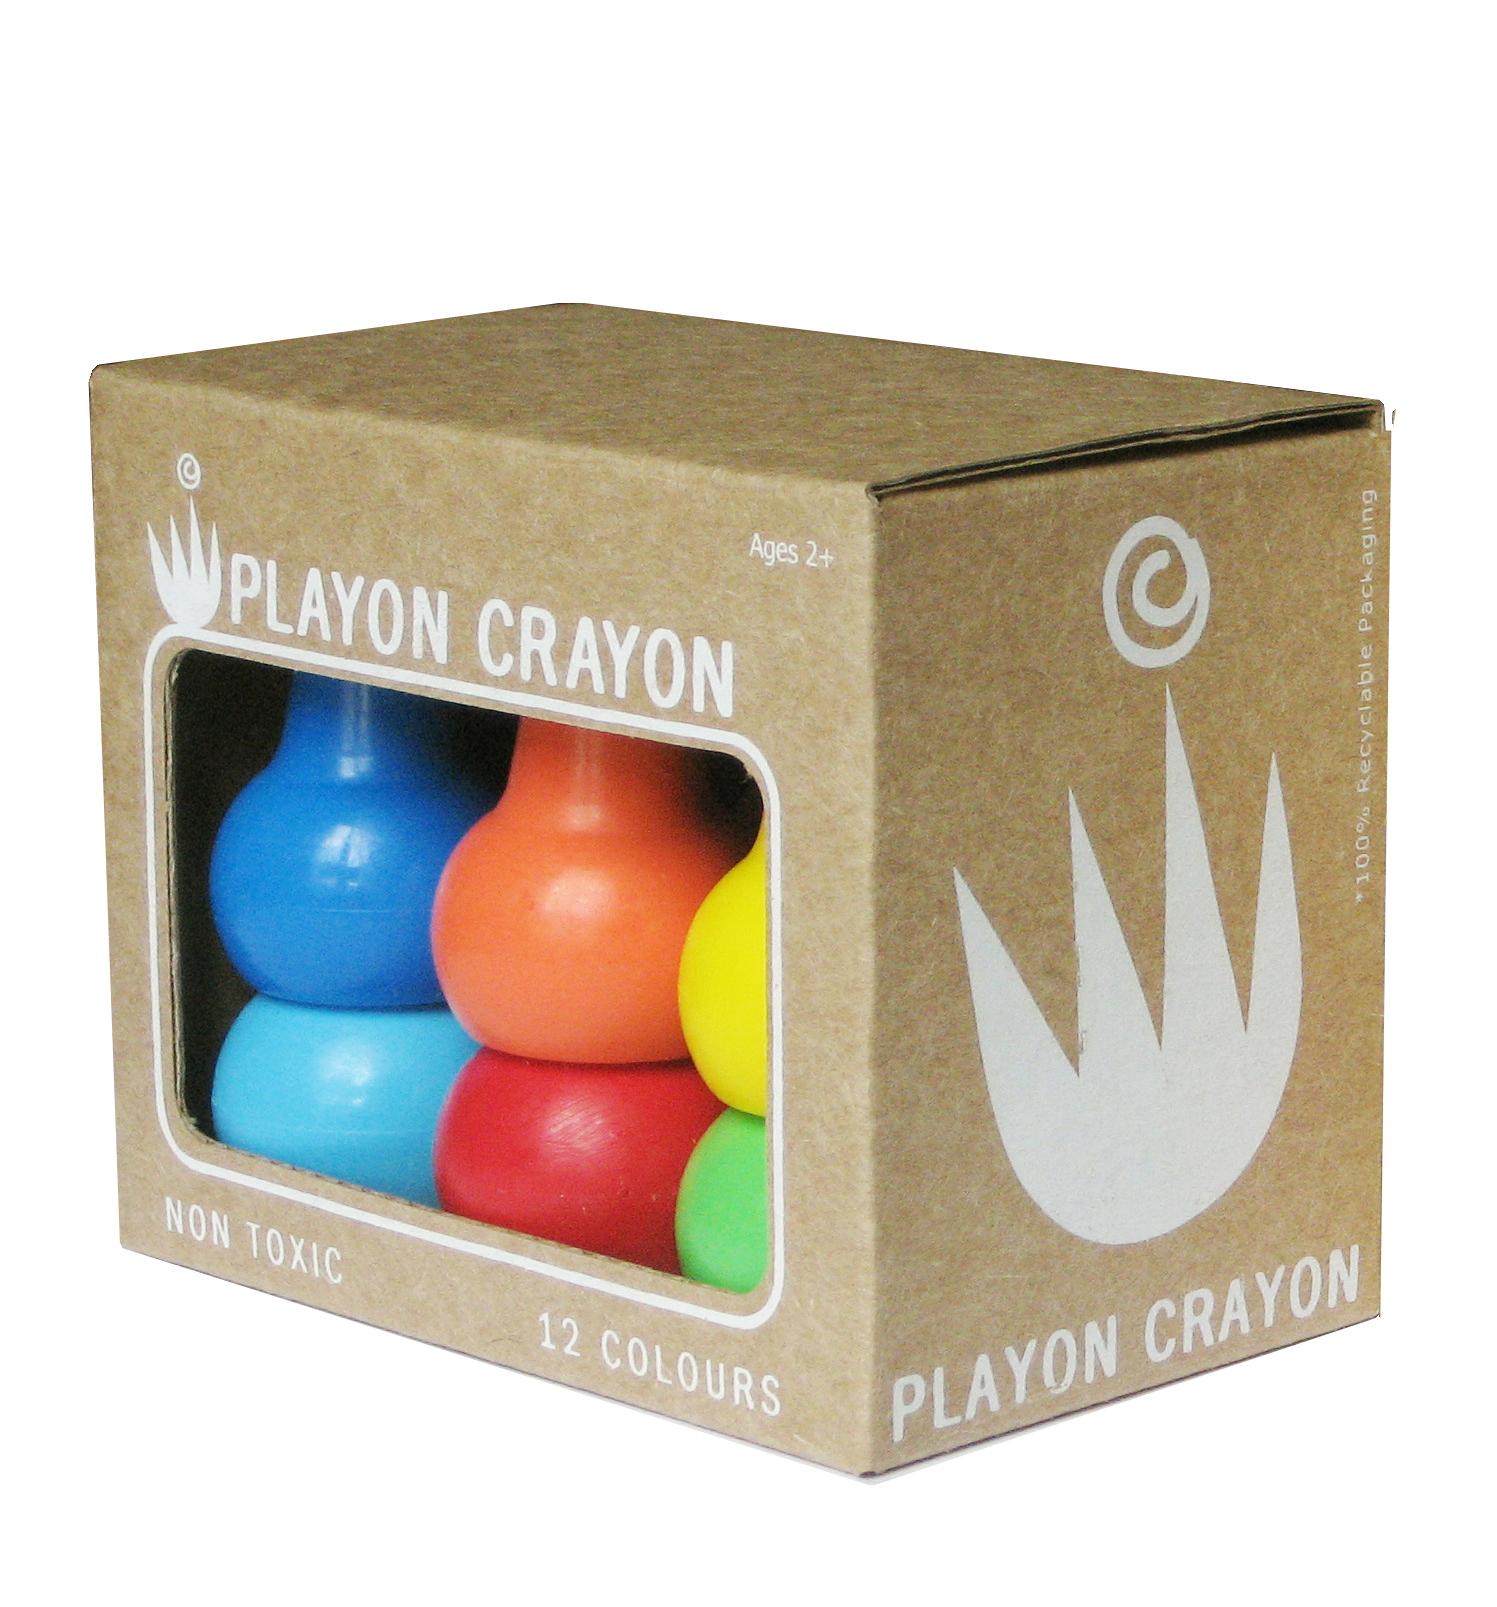 PLAYON CRAYON PRIMARY von STUDIO SKINKY - 1